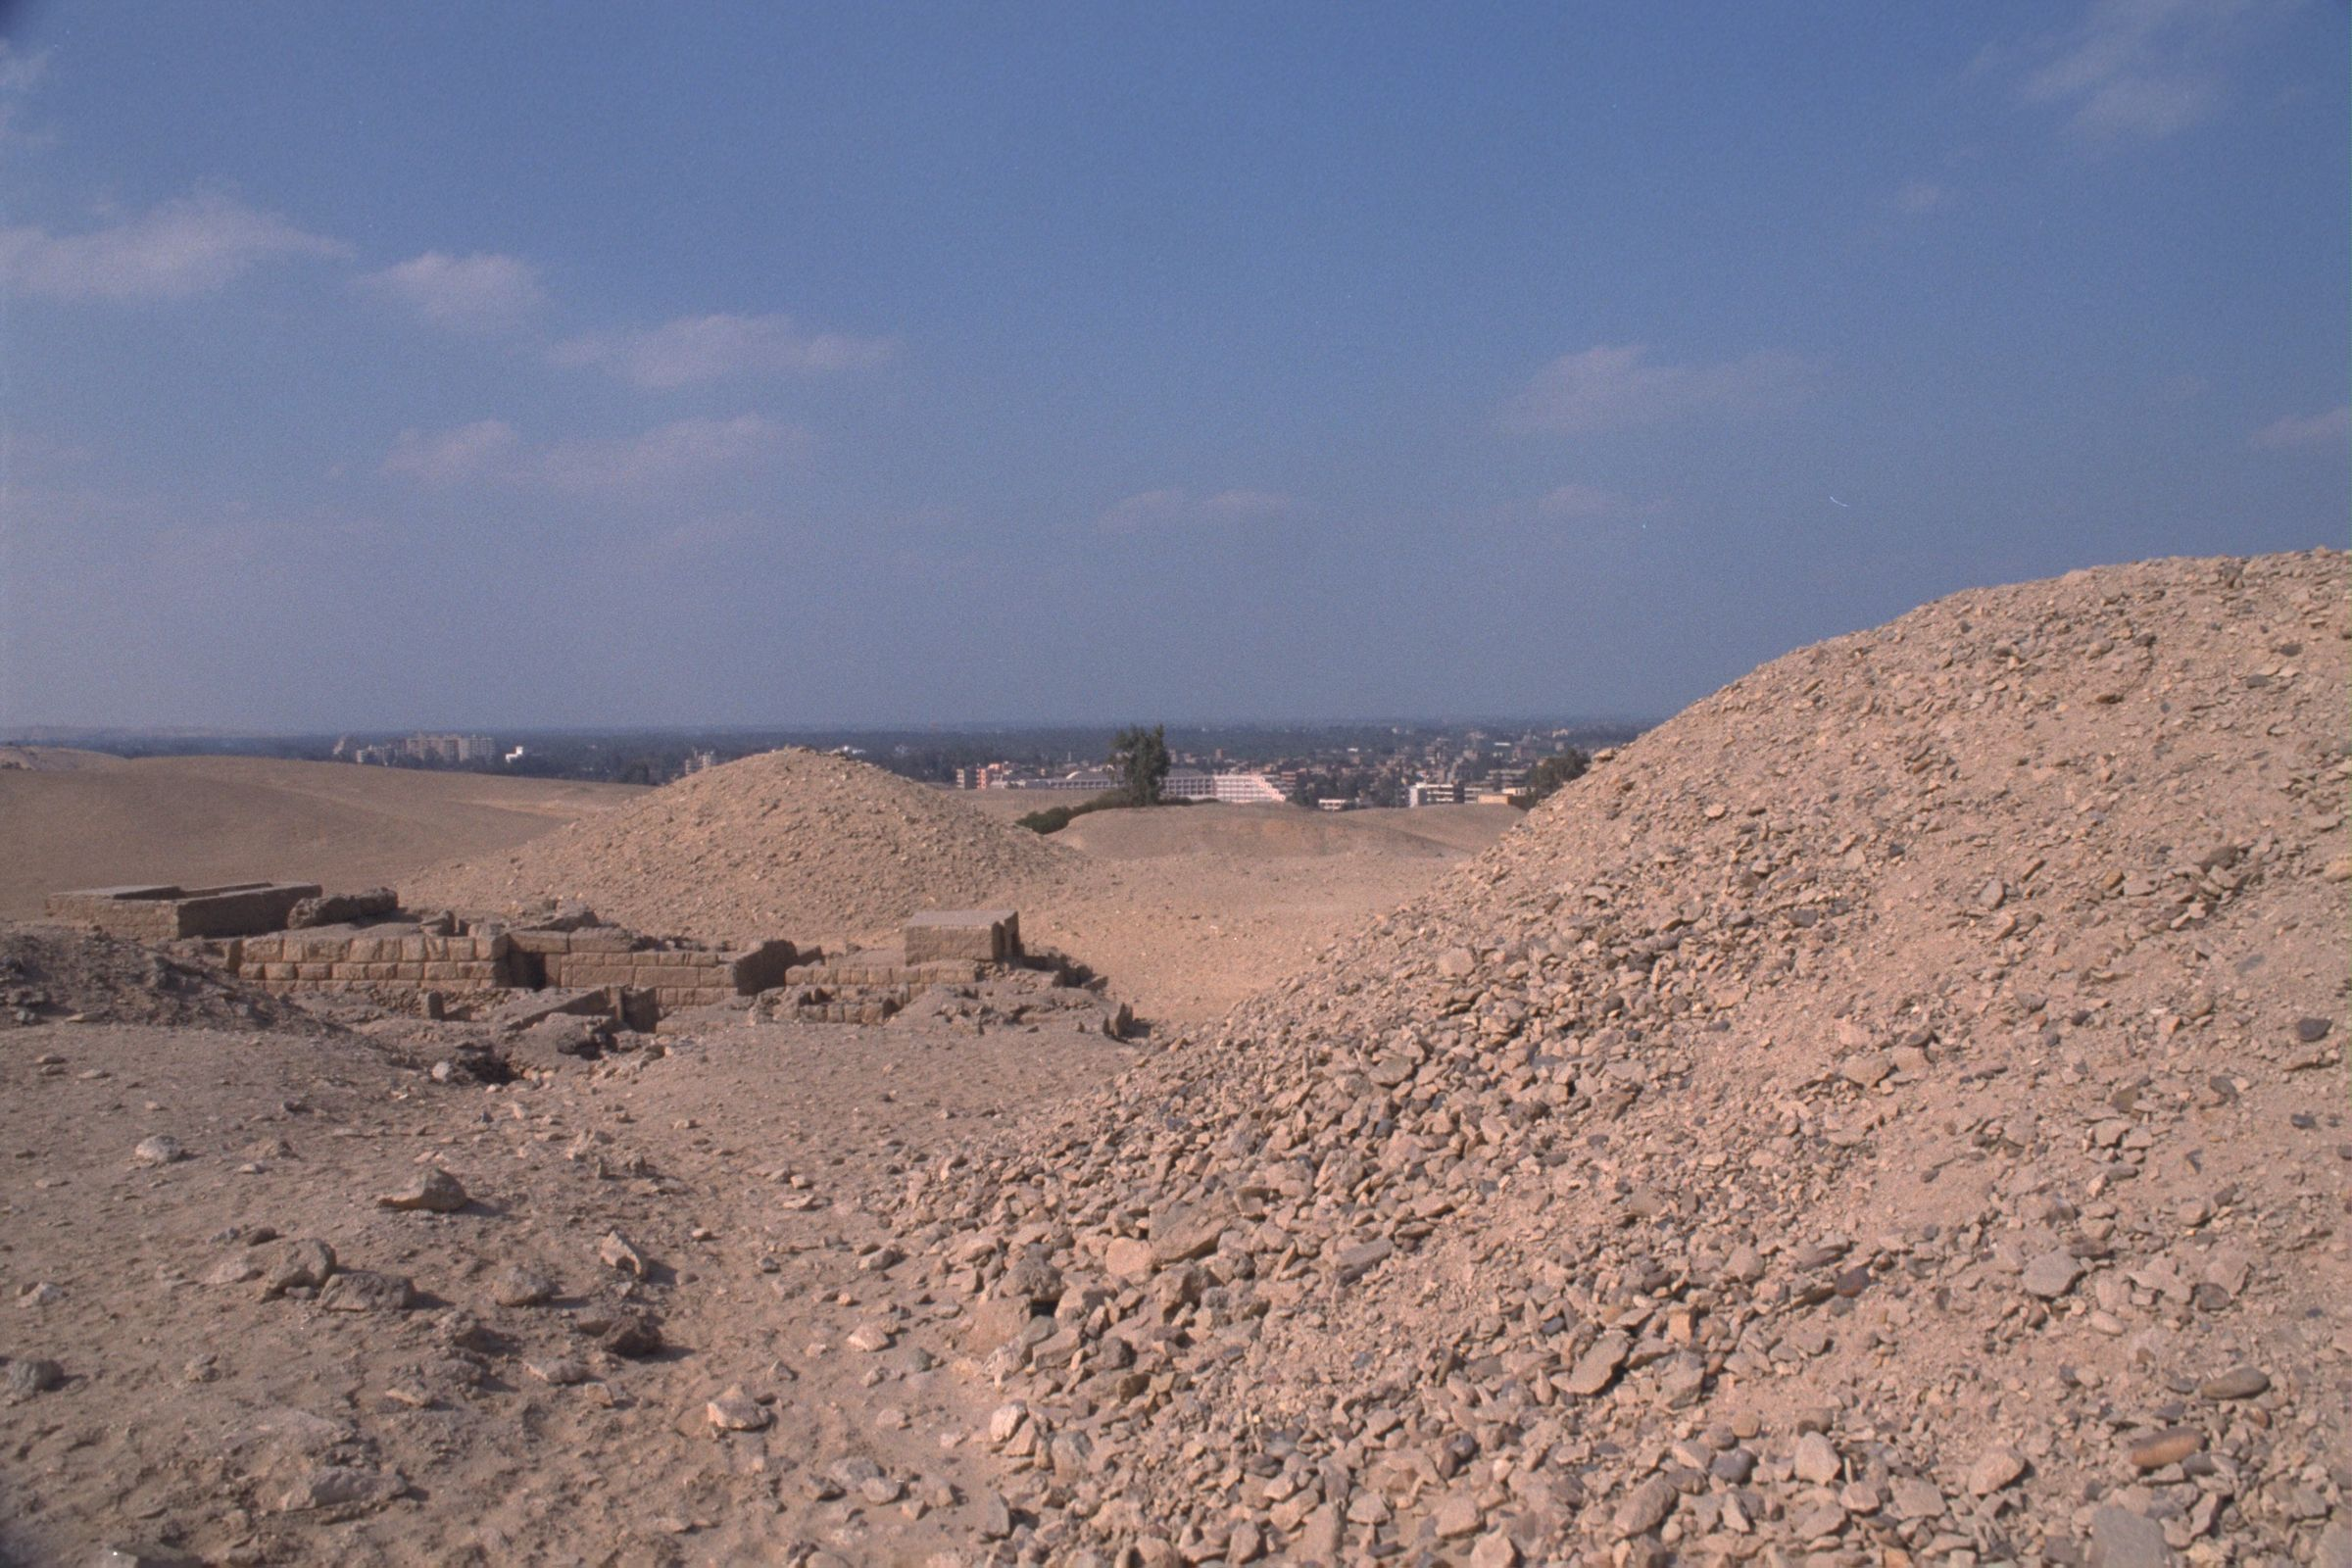 Western Cemetery: Site: Giza; View: G 2210, G 2245, G 2244, G 2246, G 2243, G 2240, G 2231